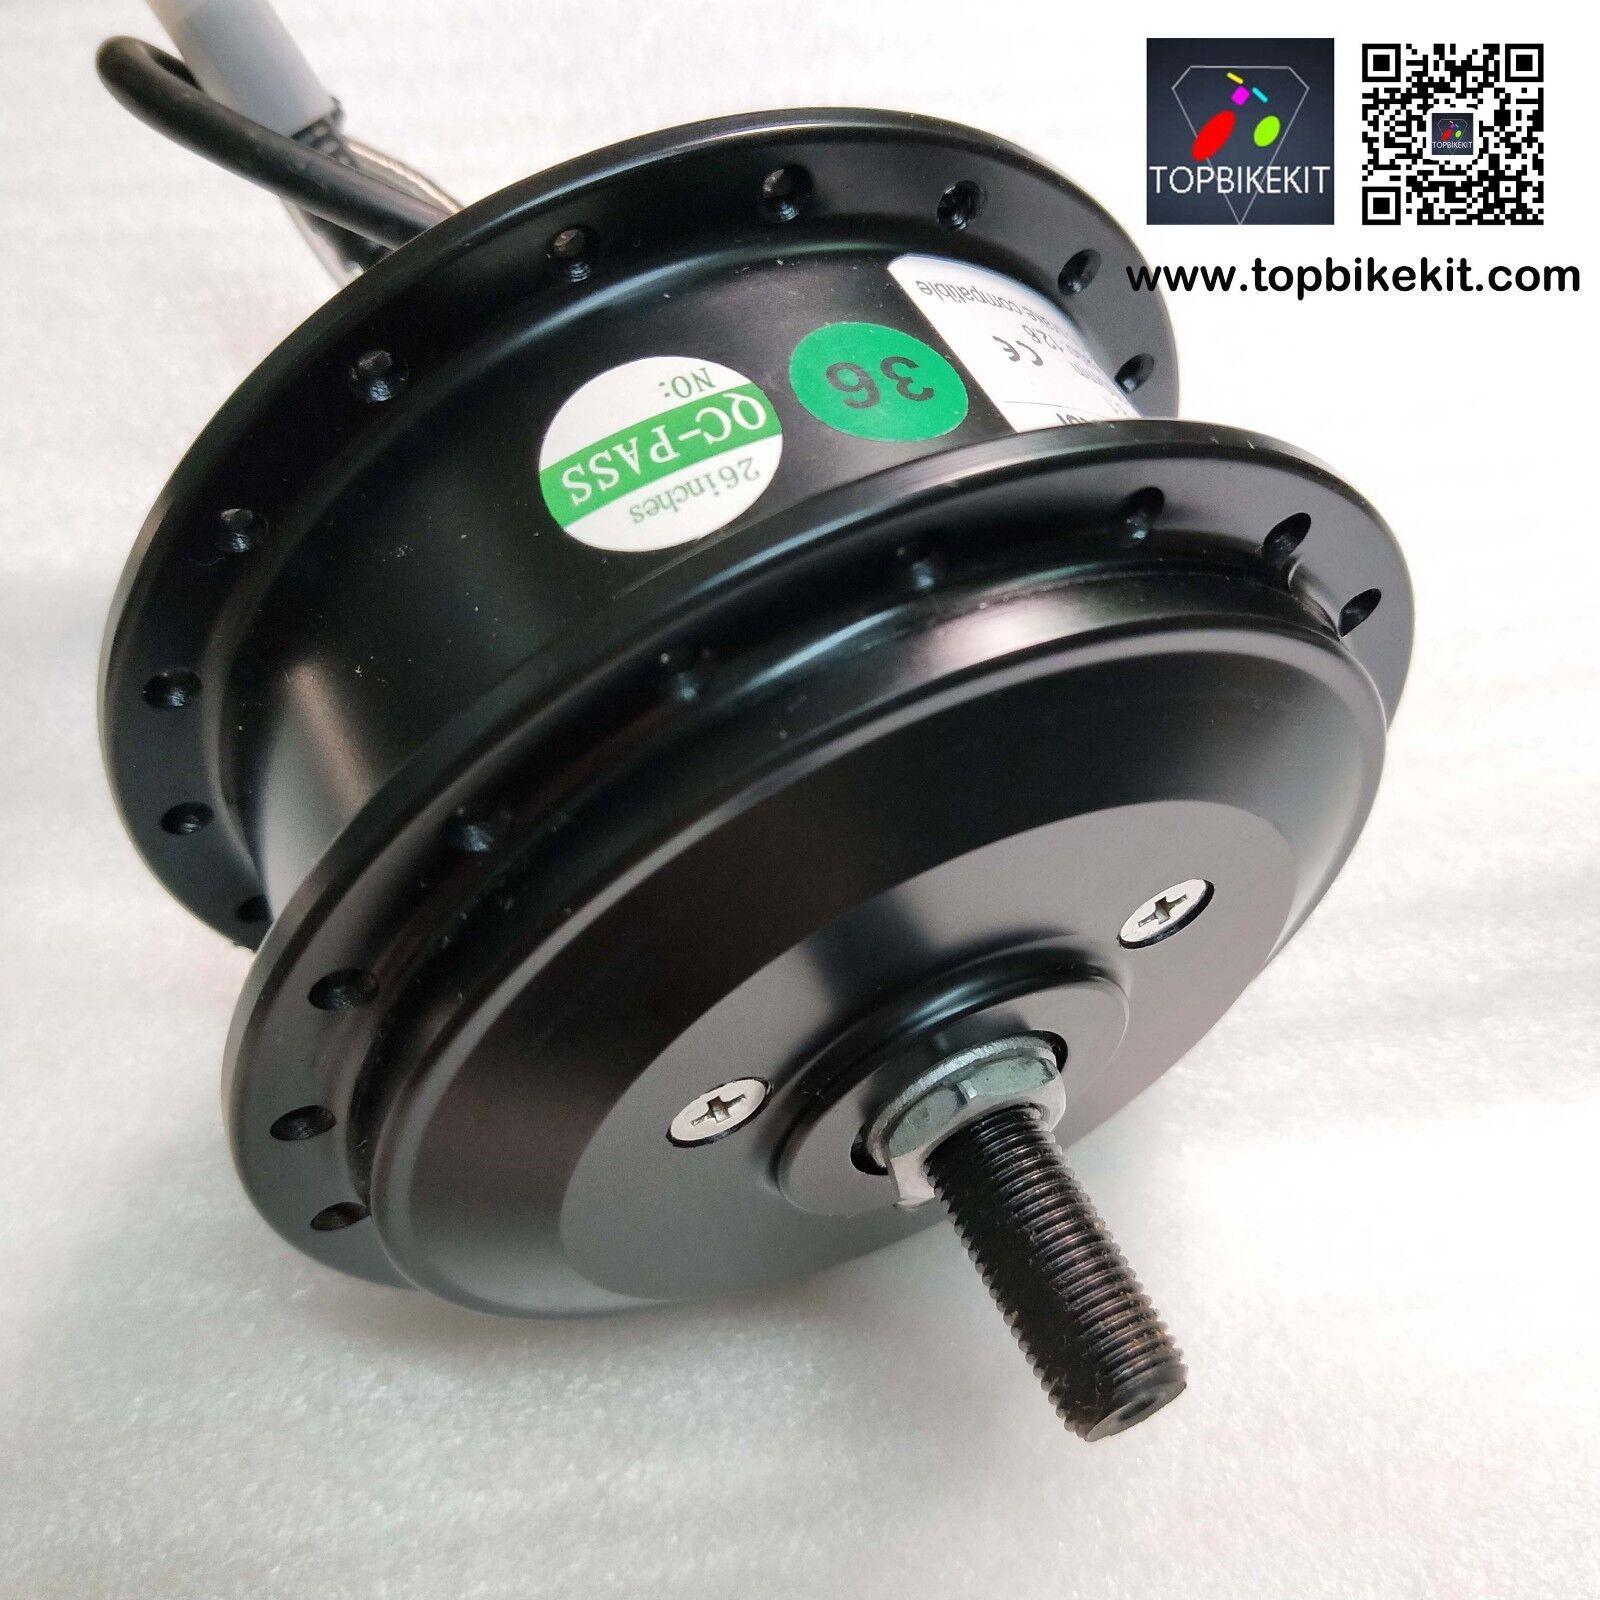 AKM-100 36V250W motor frontal RPM-201 ebike 36V250W Motor Hub tamaño de horquilla - 100mm